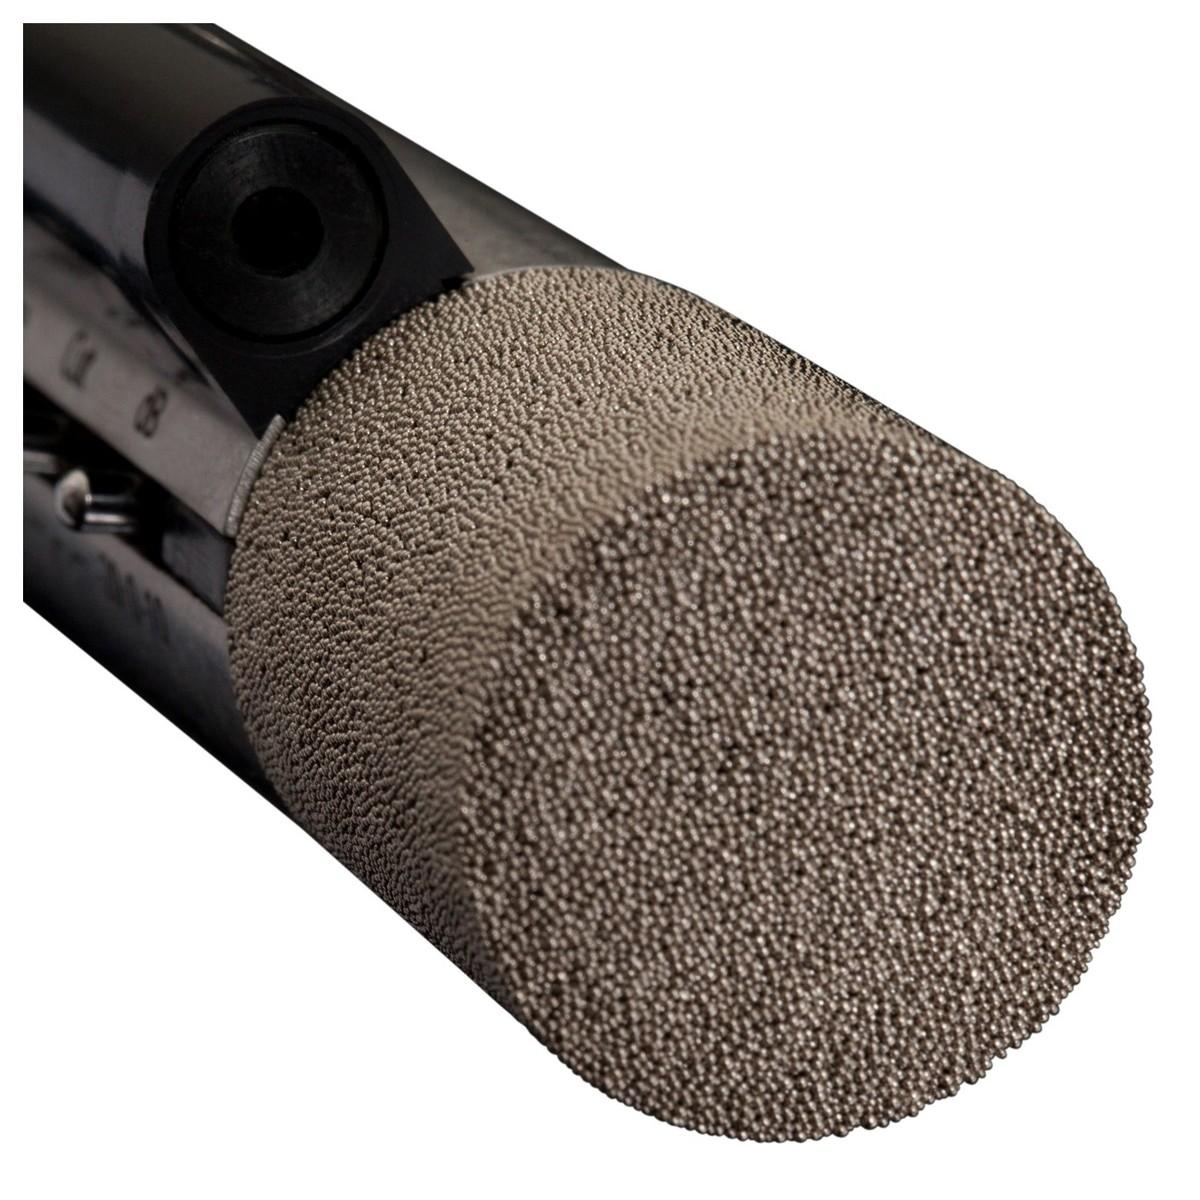 RYDDESALG | Aston Starlight | Small Diaphragm Cardioid Condenser Microphone